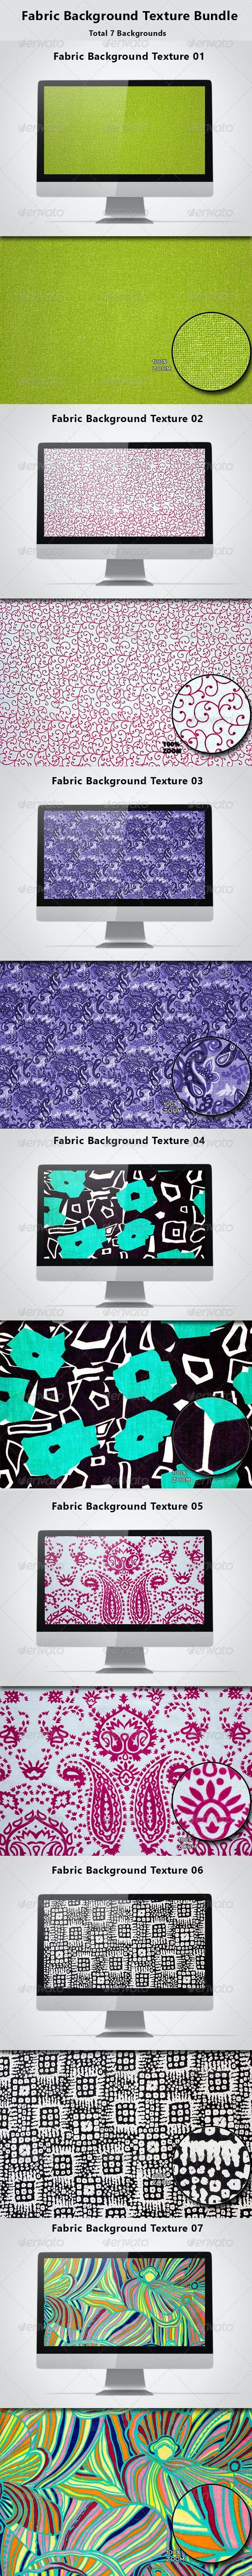 Fabric Background Texture  Bundle - Backgrounds Graphics